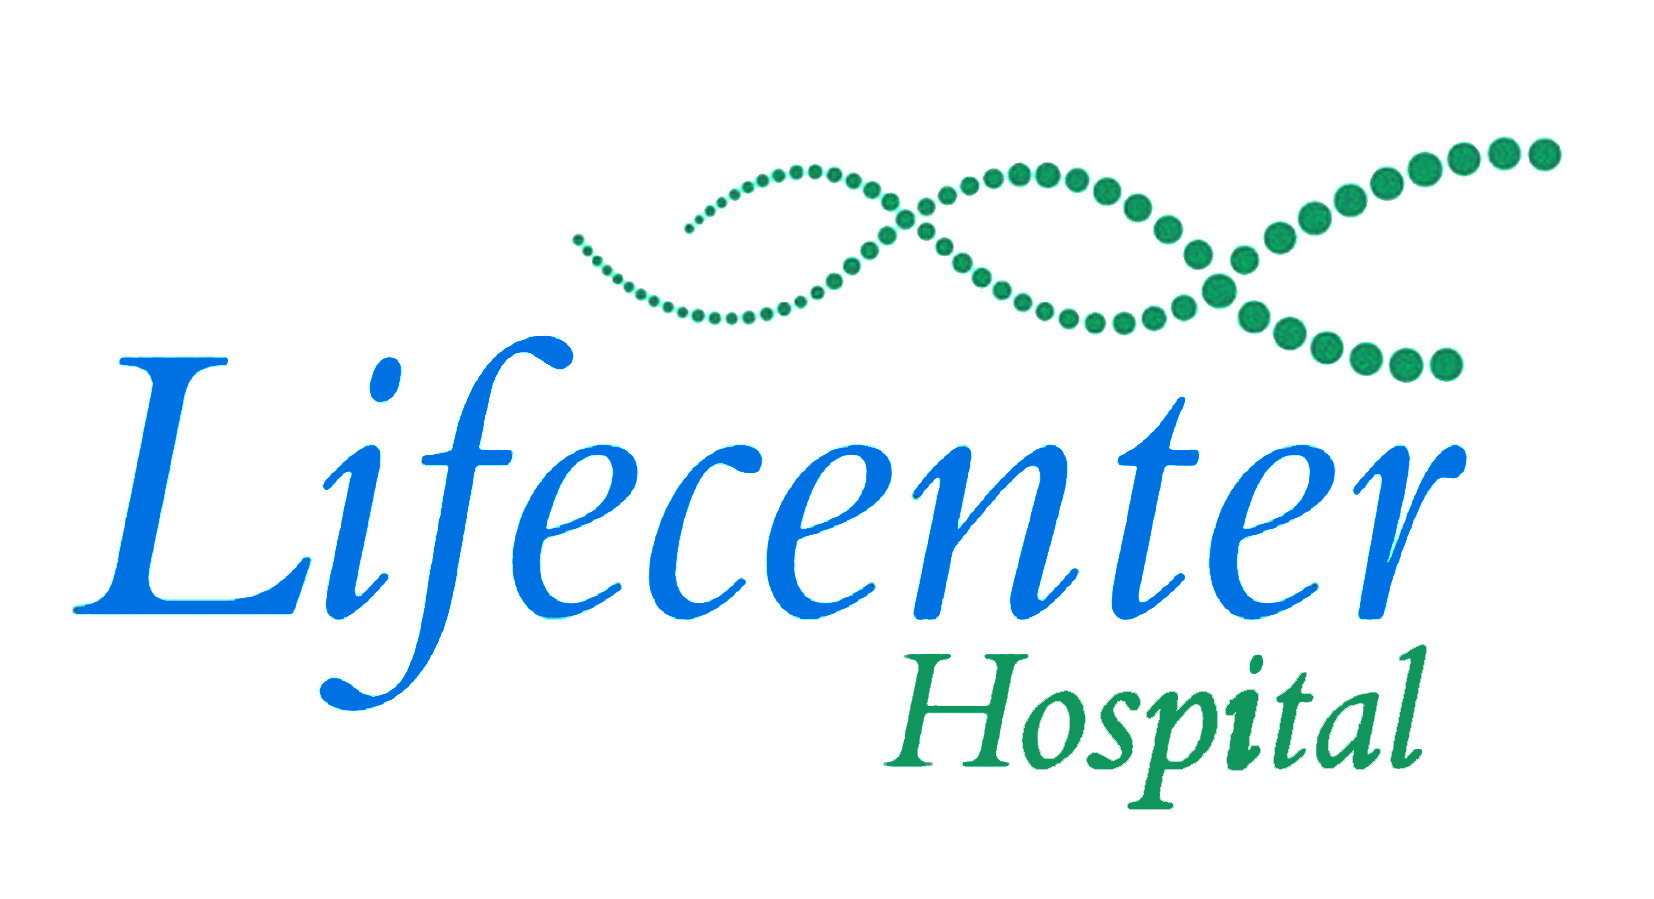 Hospital Lifecenter.jpg